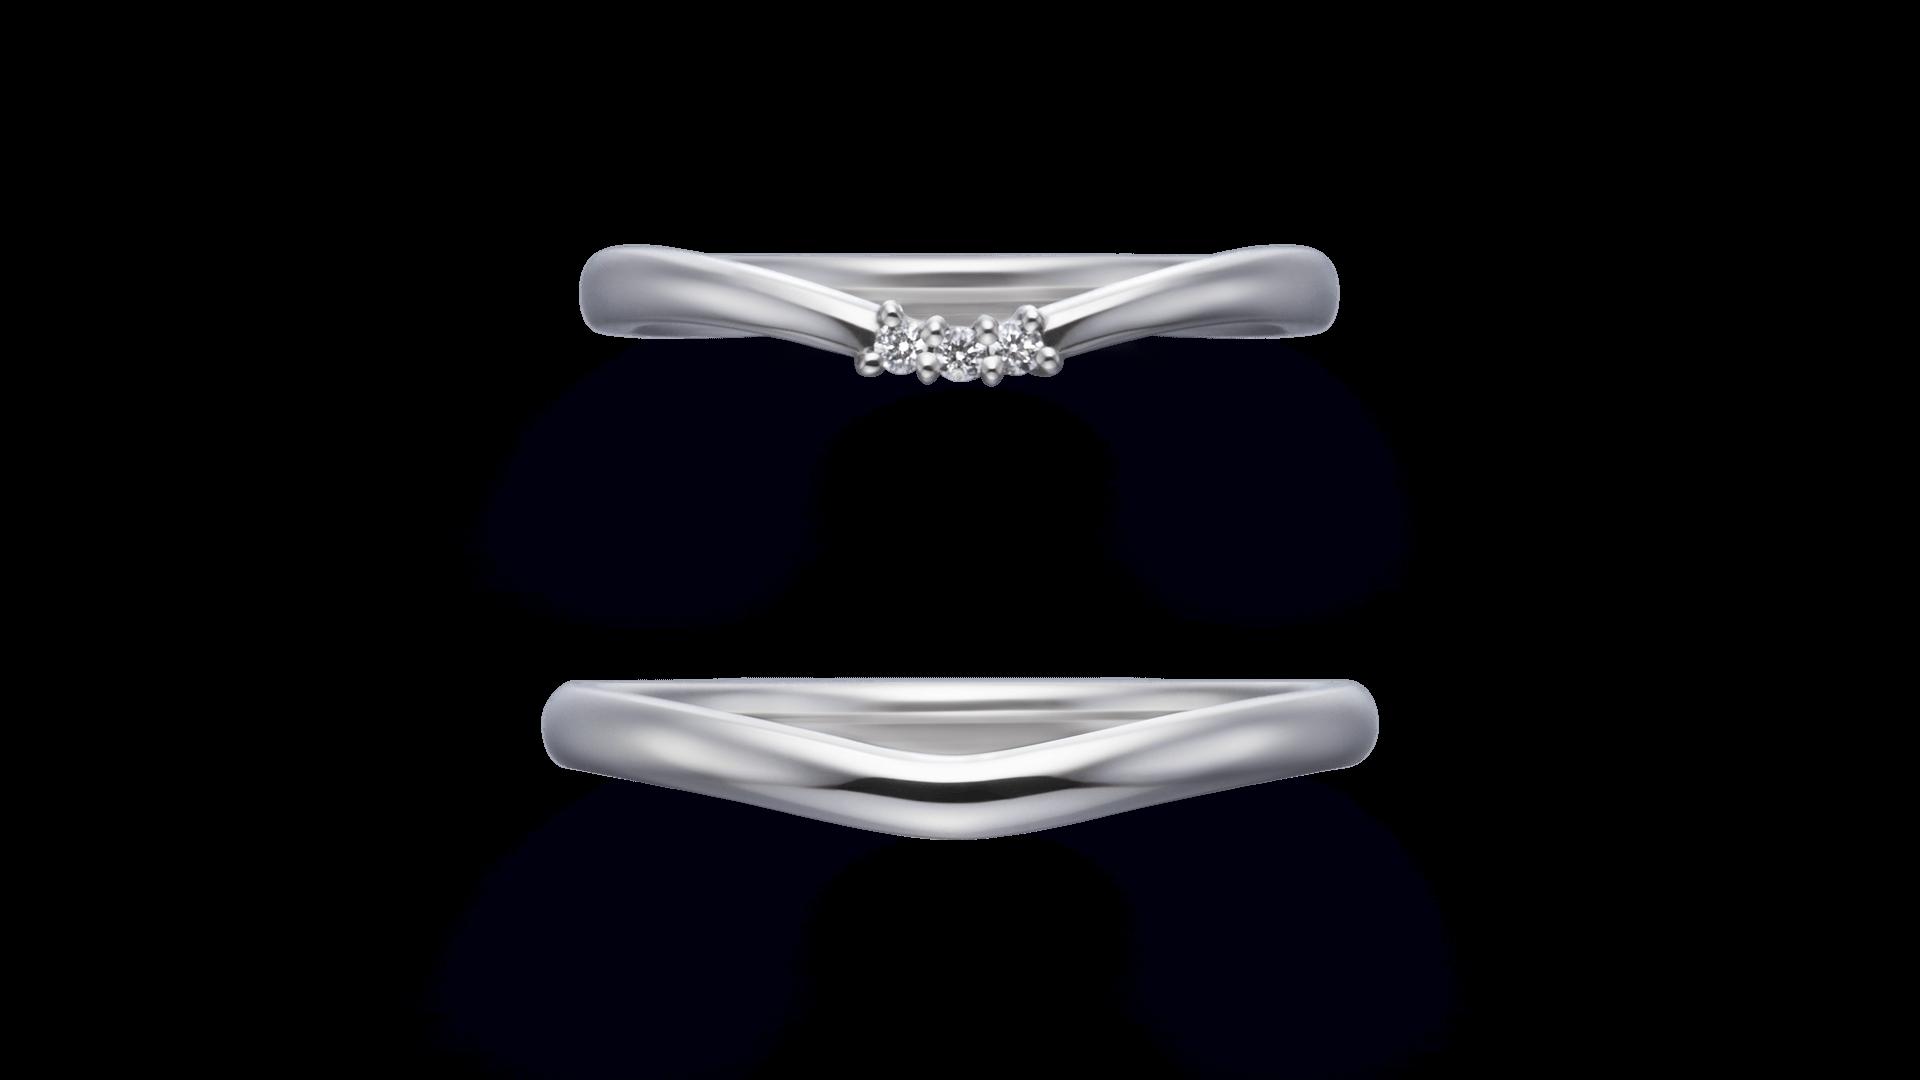 napaea ナパイア | 結婚指輪サムネイル 1